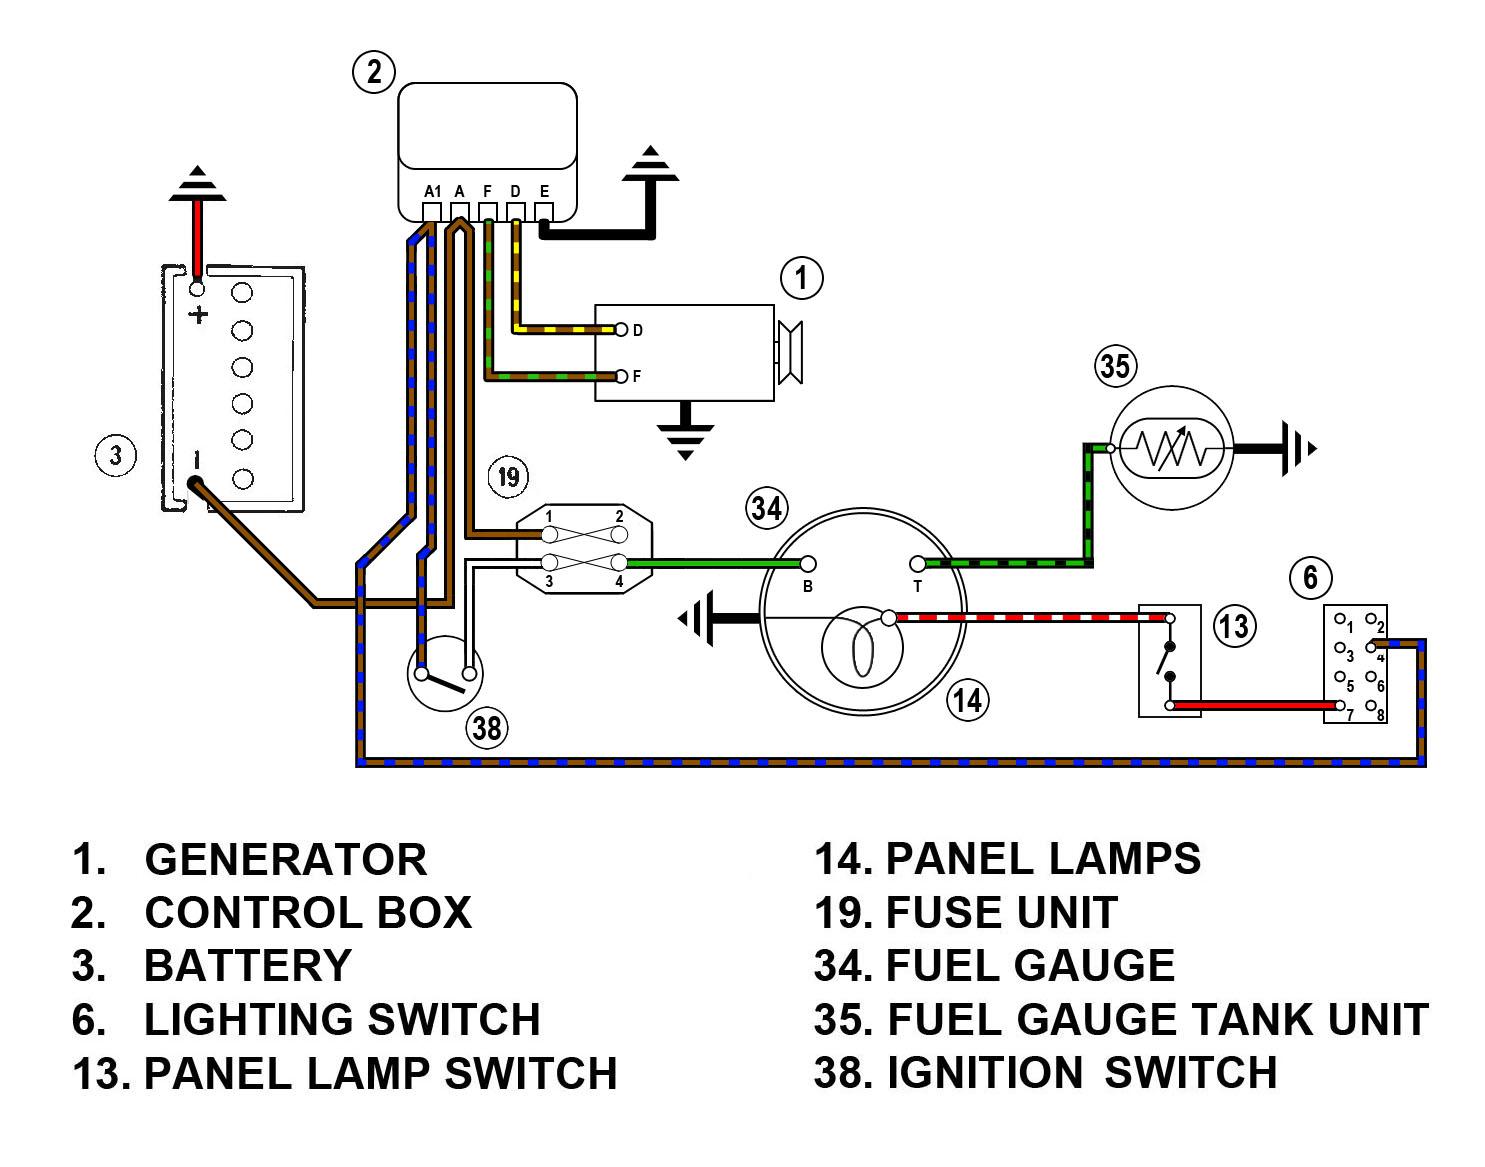 Johnson Les Paul Wiring Diagram Electrical Diagrams Guitar Ernie Ball Guitars